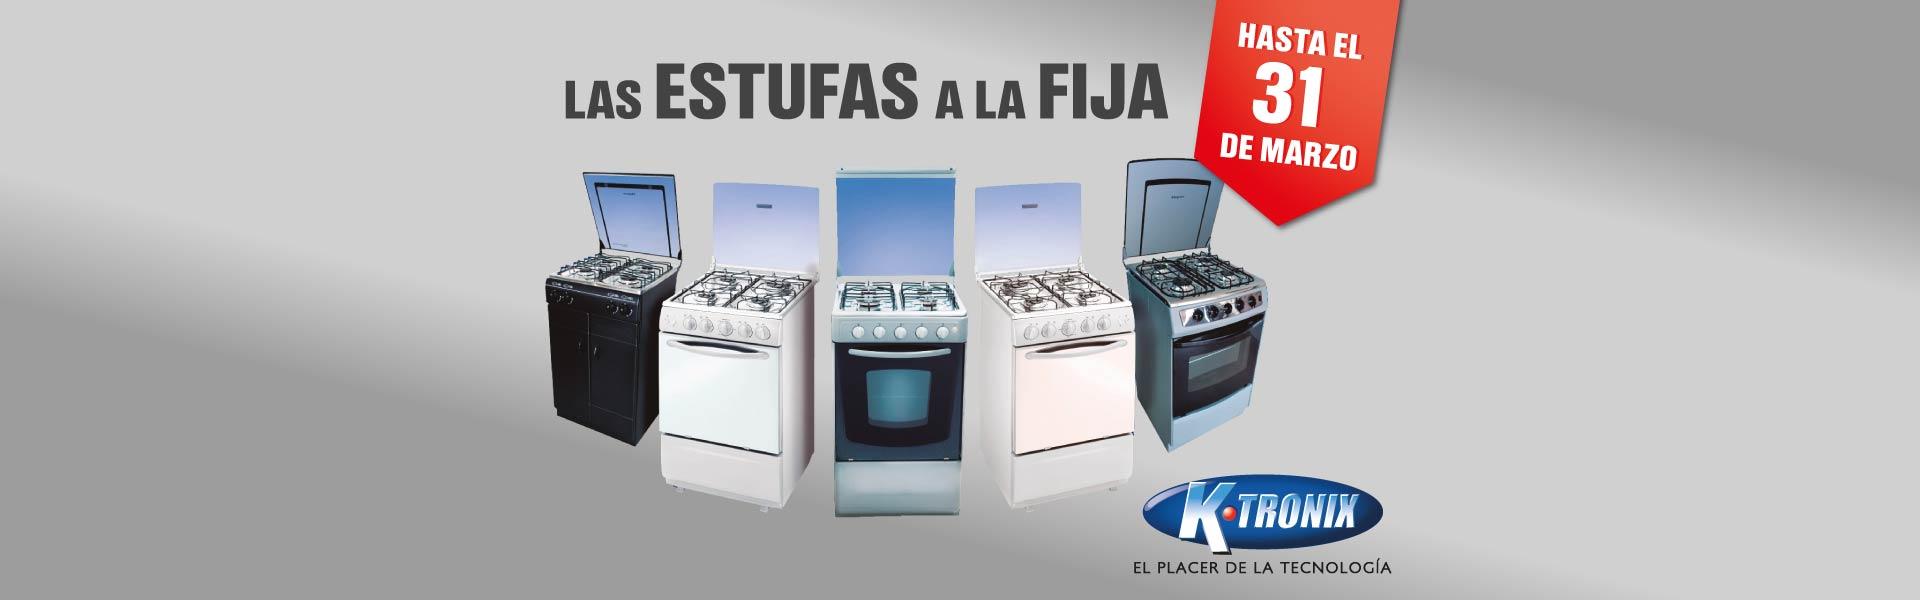 PPAL-KT-5-lb-estufas-a-la-fija-en-alkosto-cat-marzo21-23